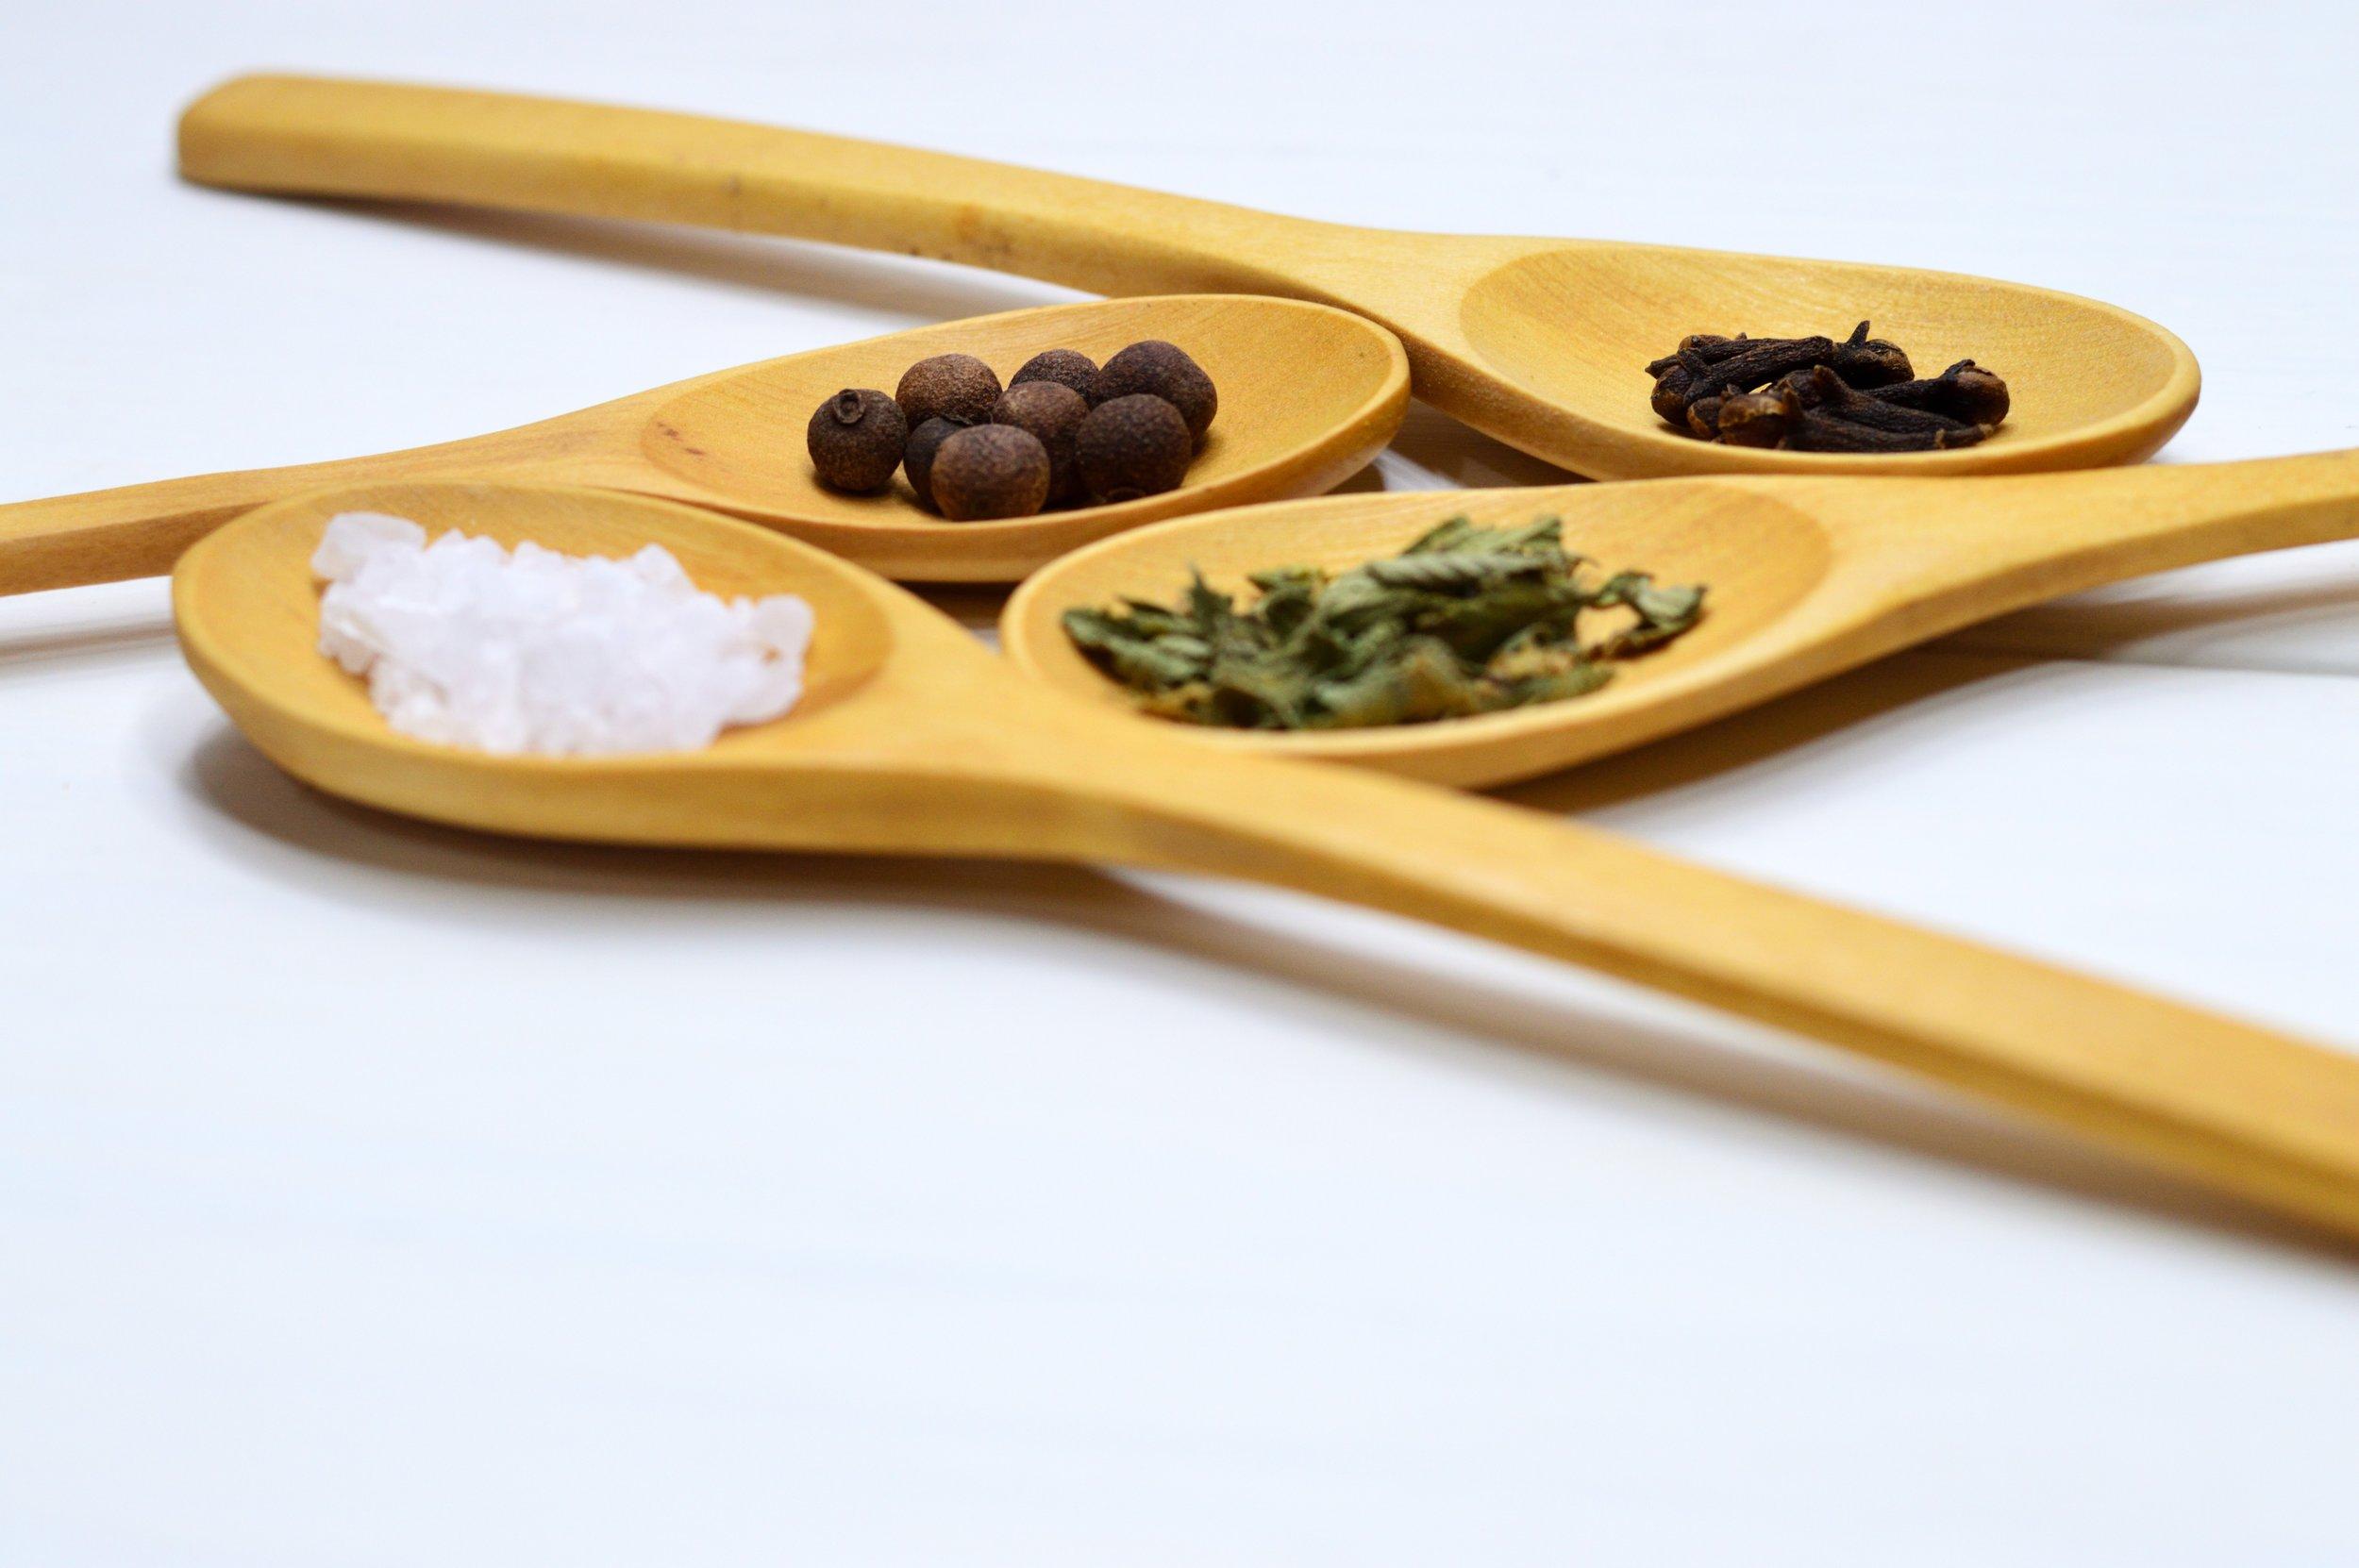 food-oregano-pepper-971077.jpg